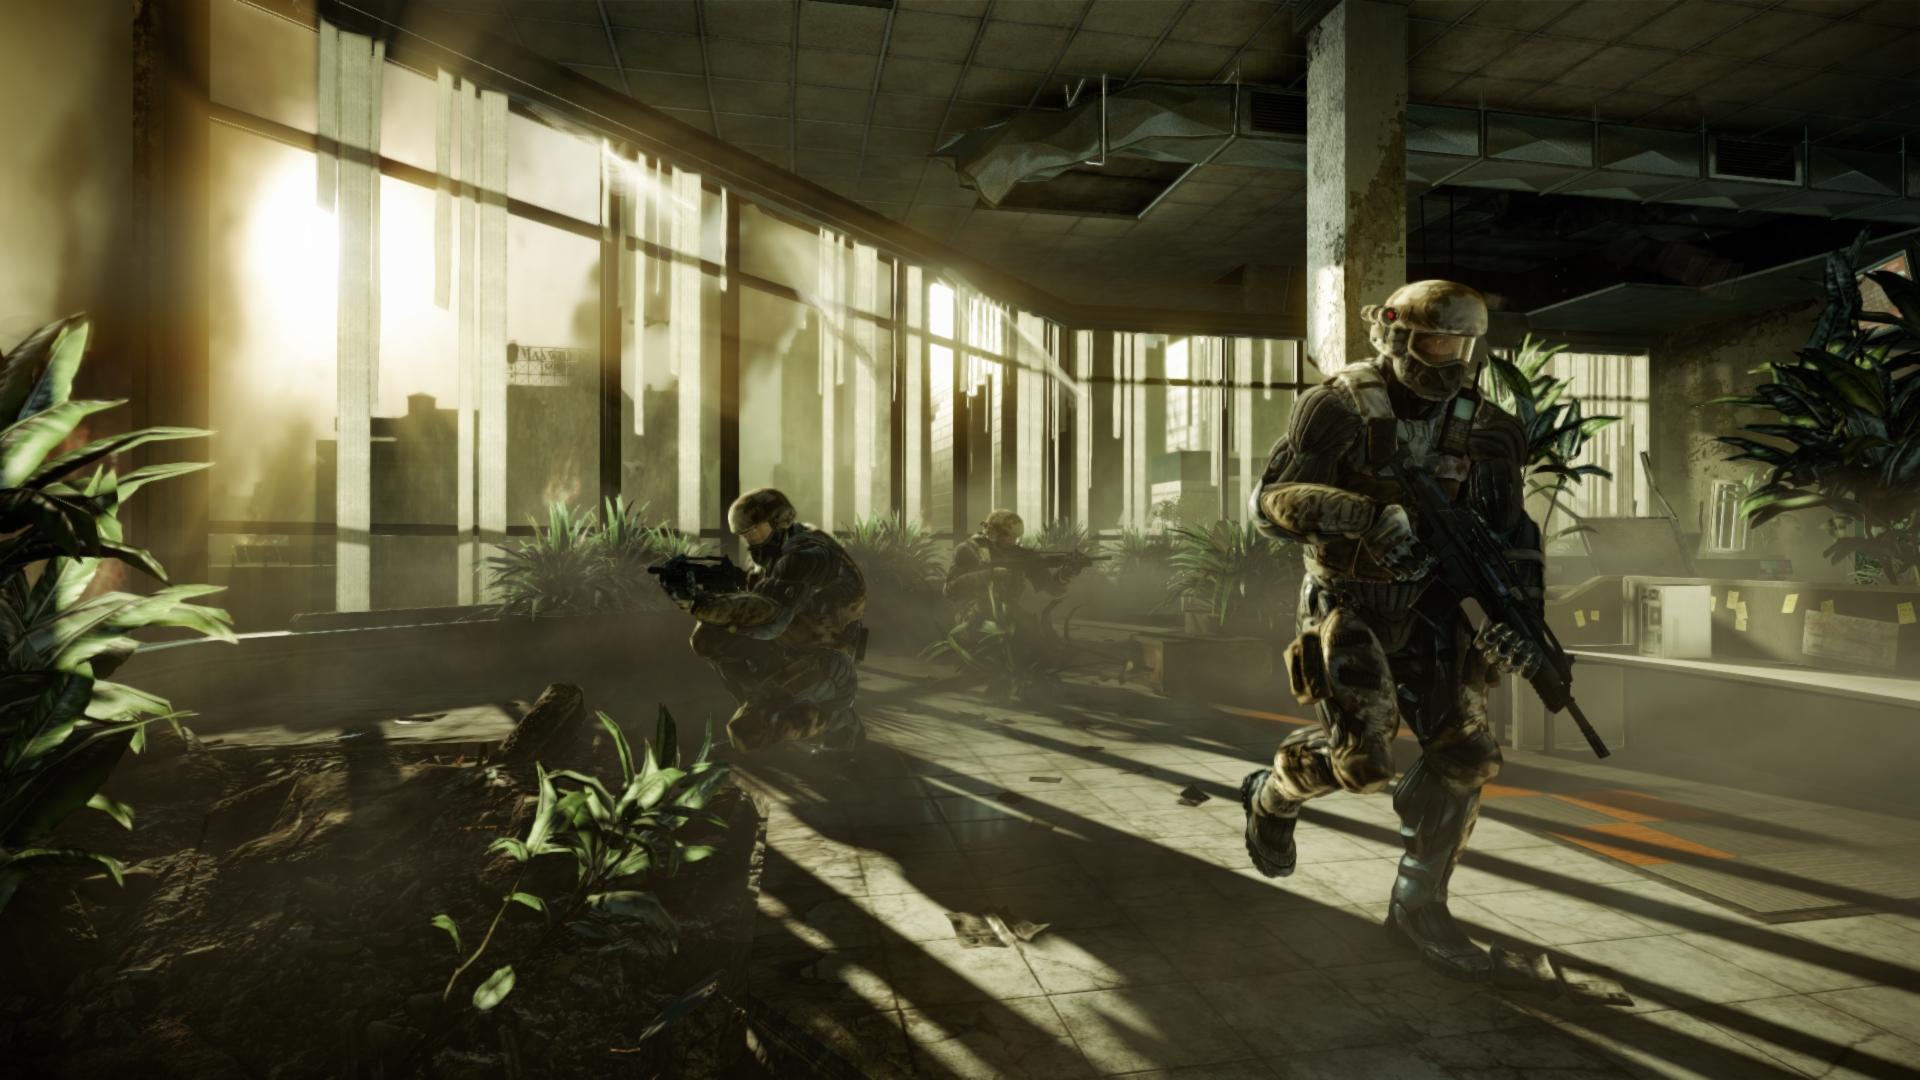 Dojmy z GamesComu - Medal of Honor, Crysis 2 a Dead Space 2 12527